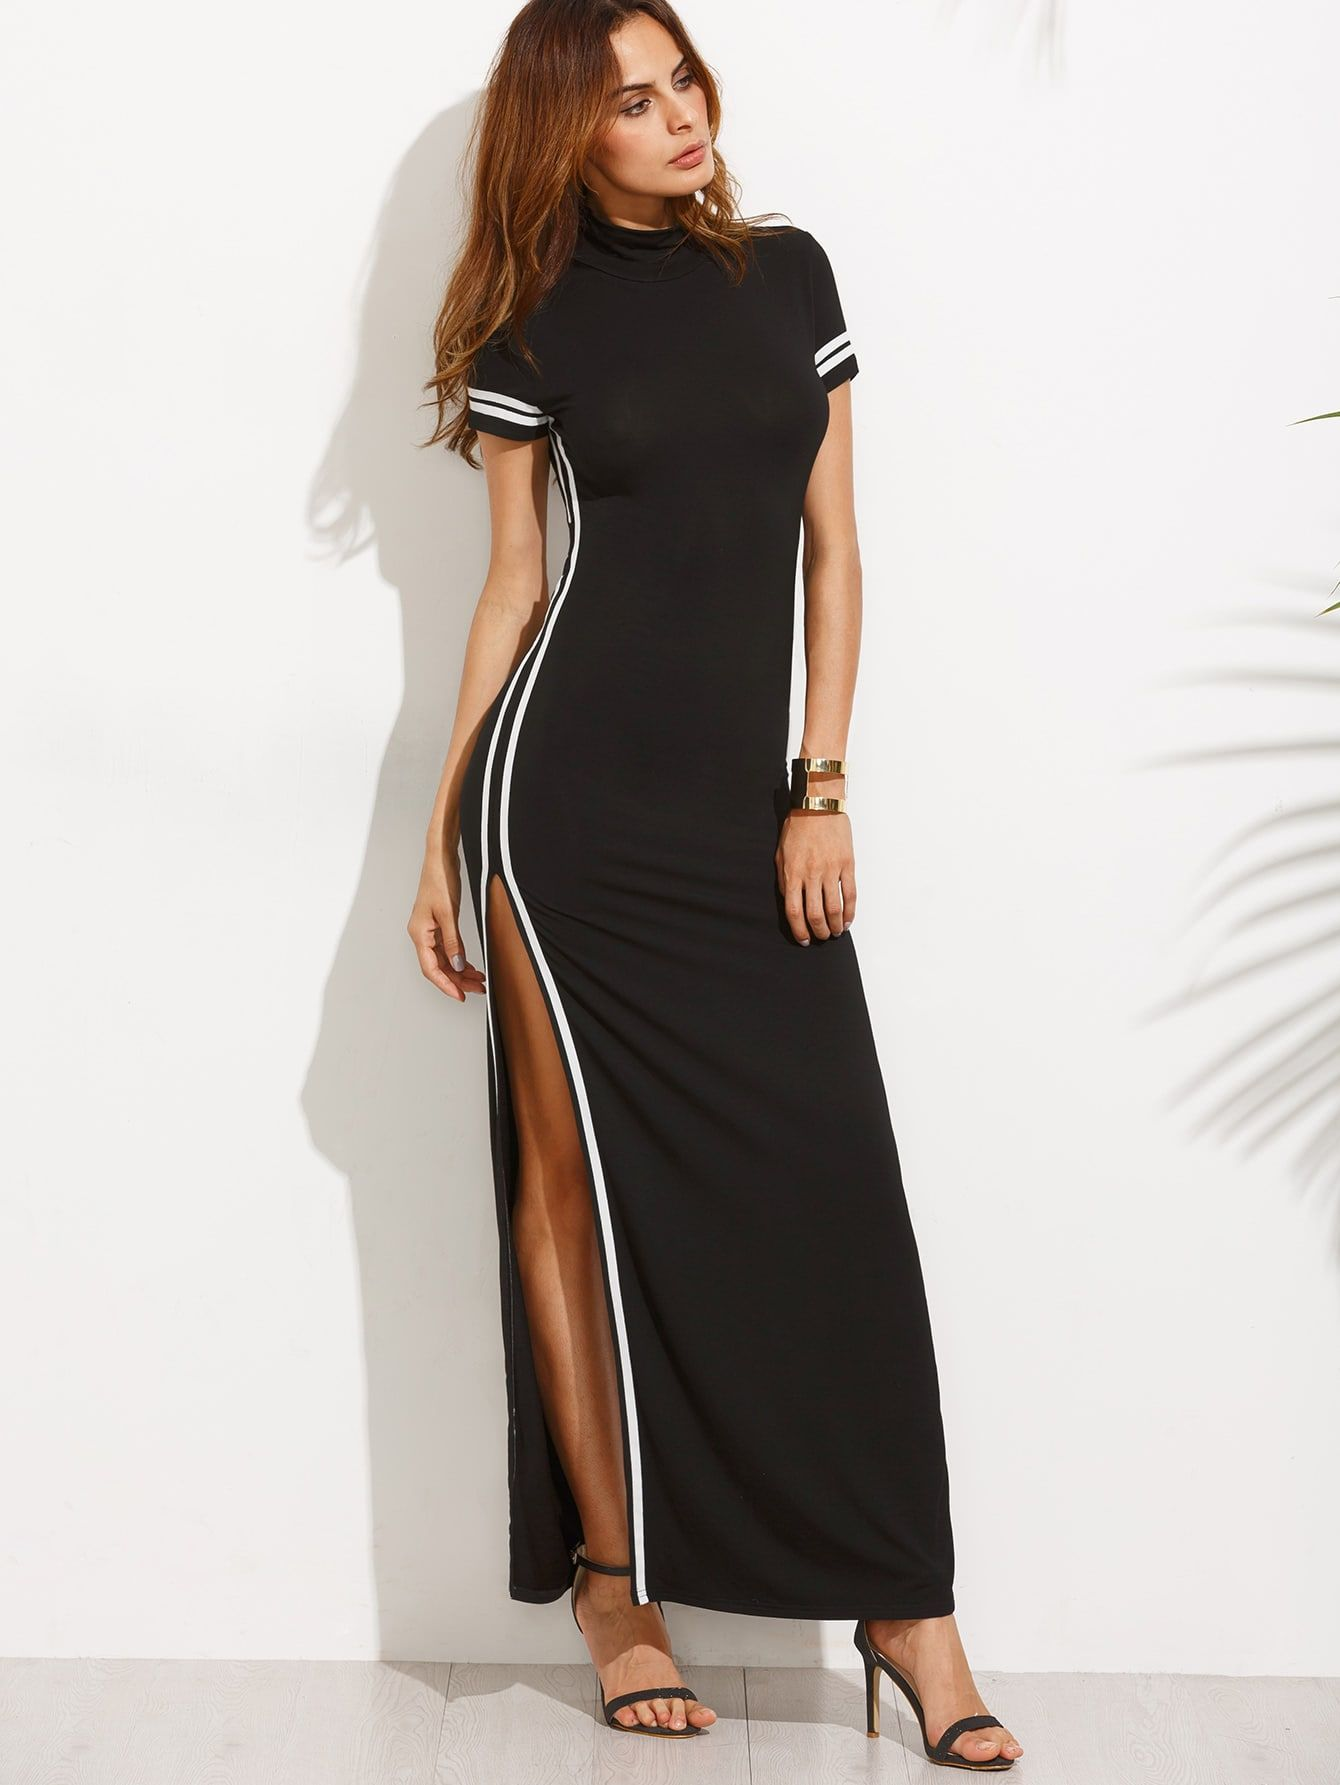 dd5e07f8520 Striped Trim High Split Cutout Back Dress -SheIn(Sheinside)